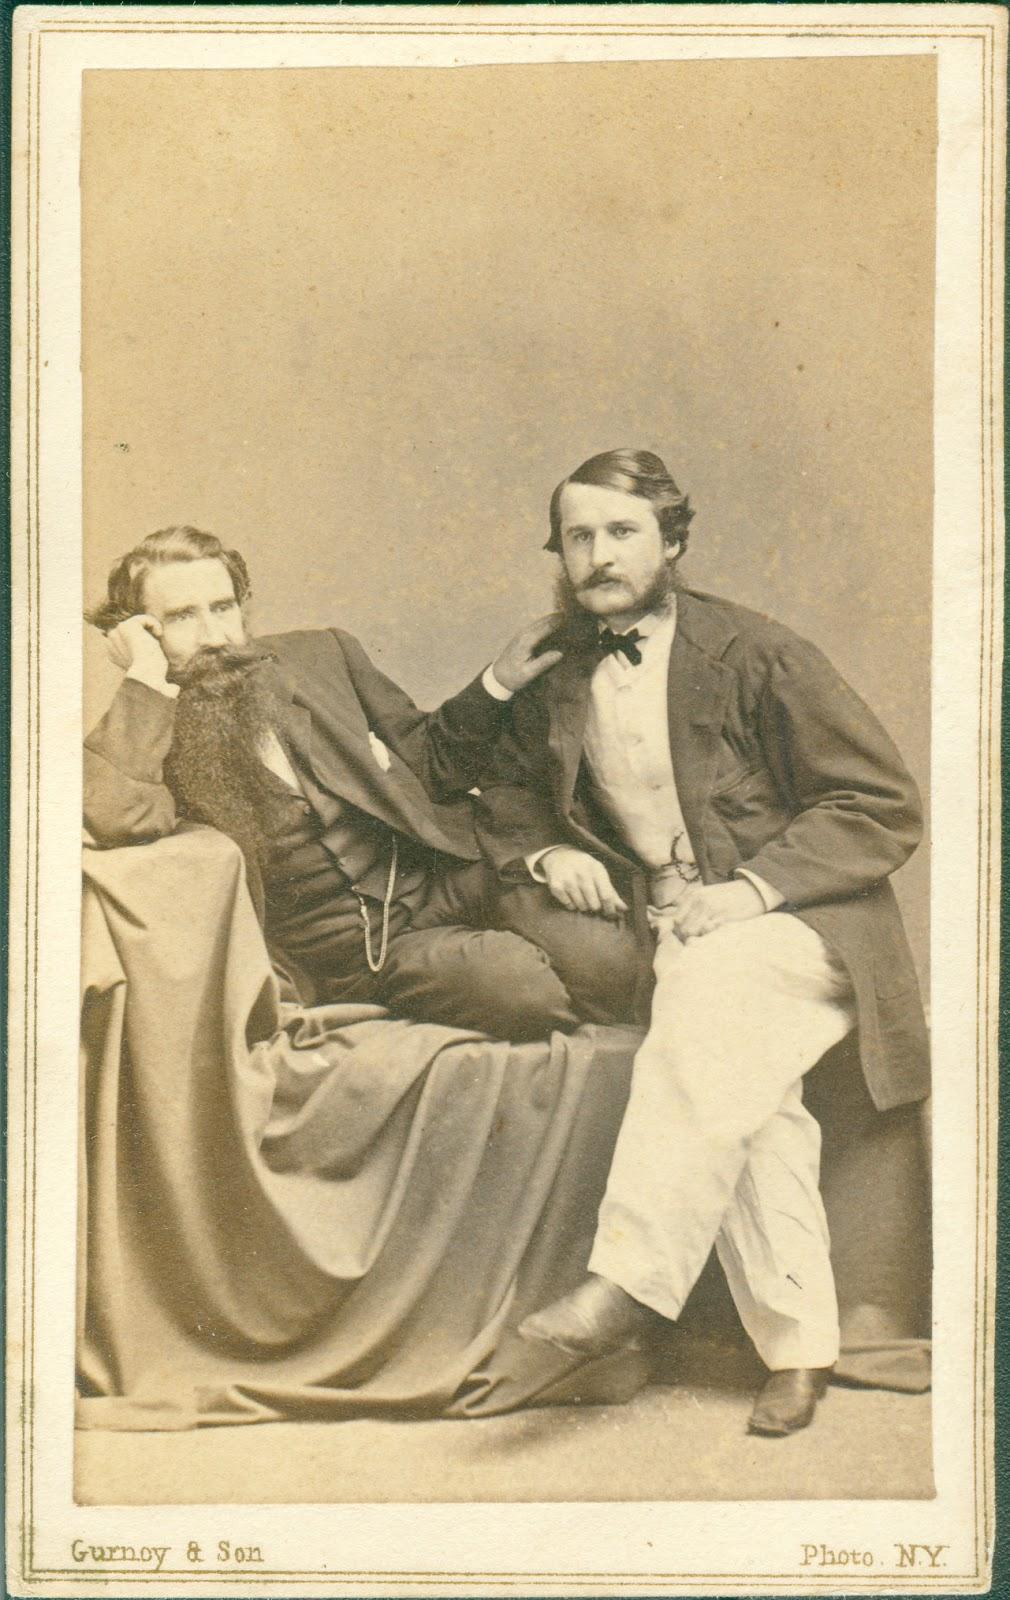 Jeremiah Gurney And Ben Carte De Visite Ca 1862 Courtesy Of Armand Gregoris